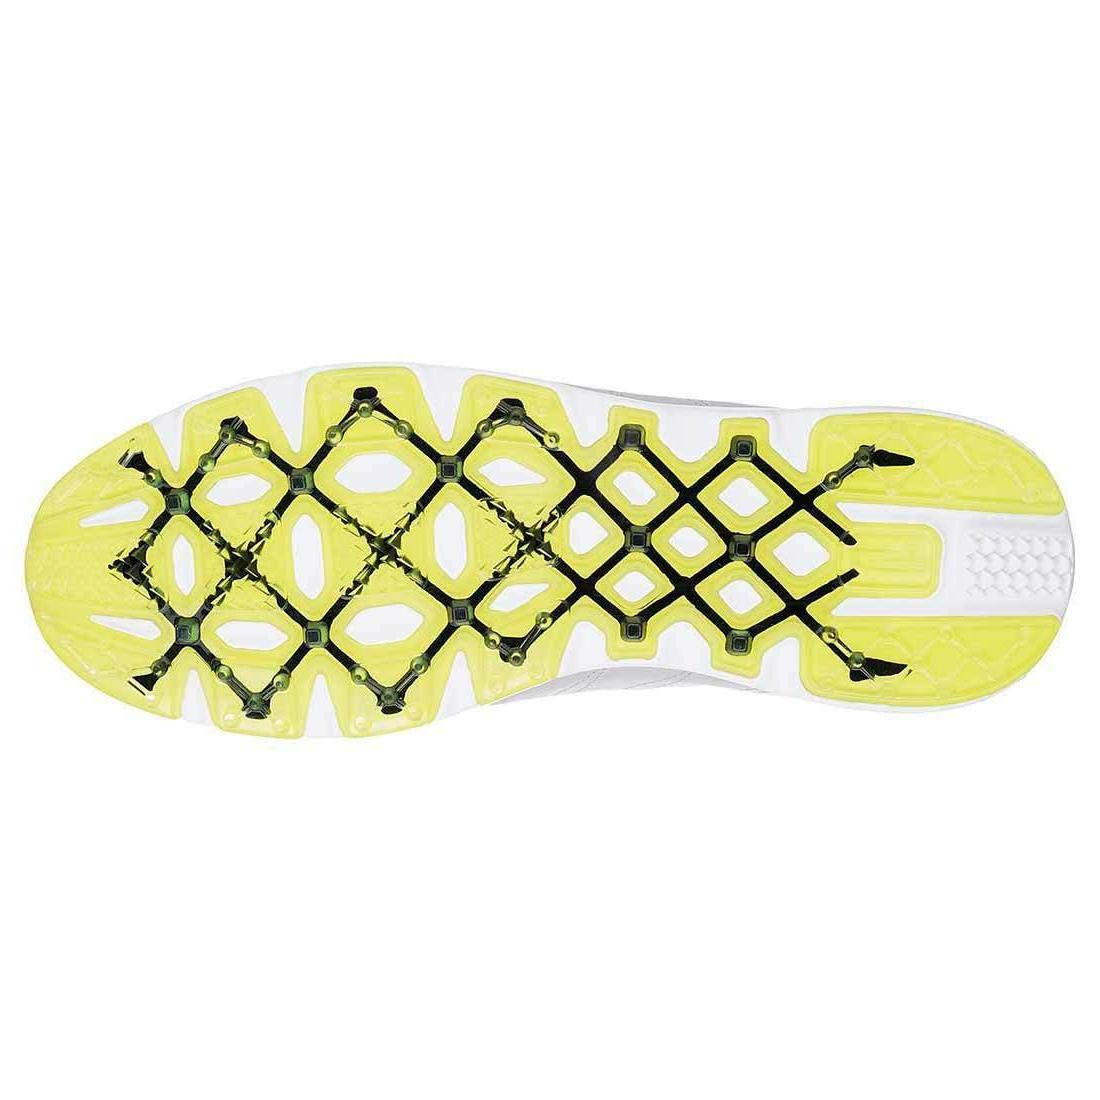 New Skechers Elite Shoes